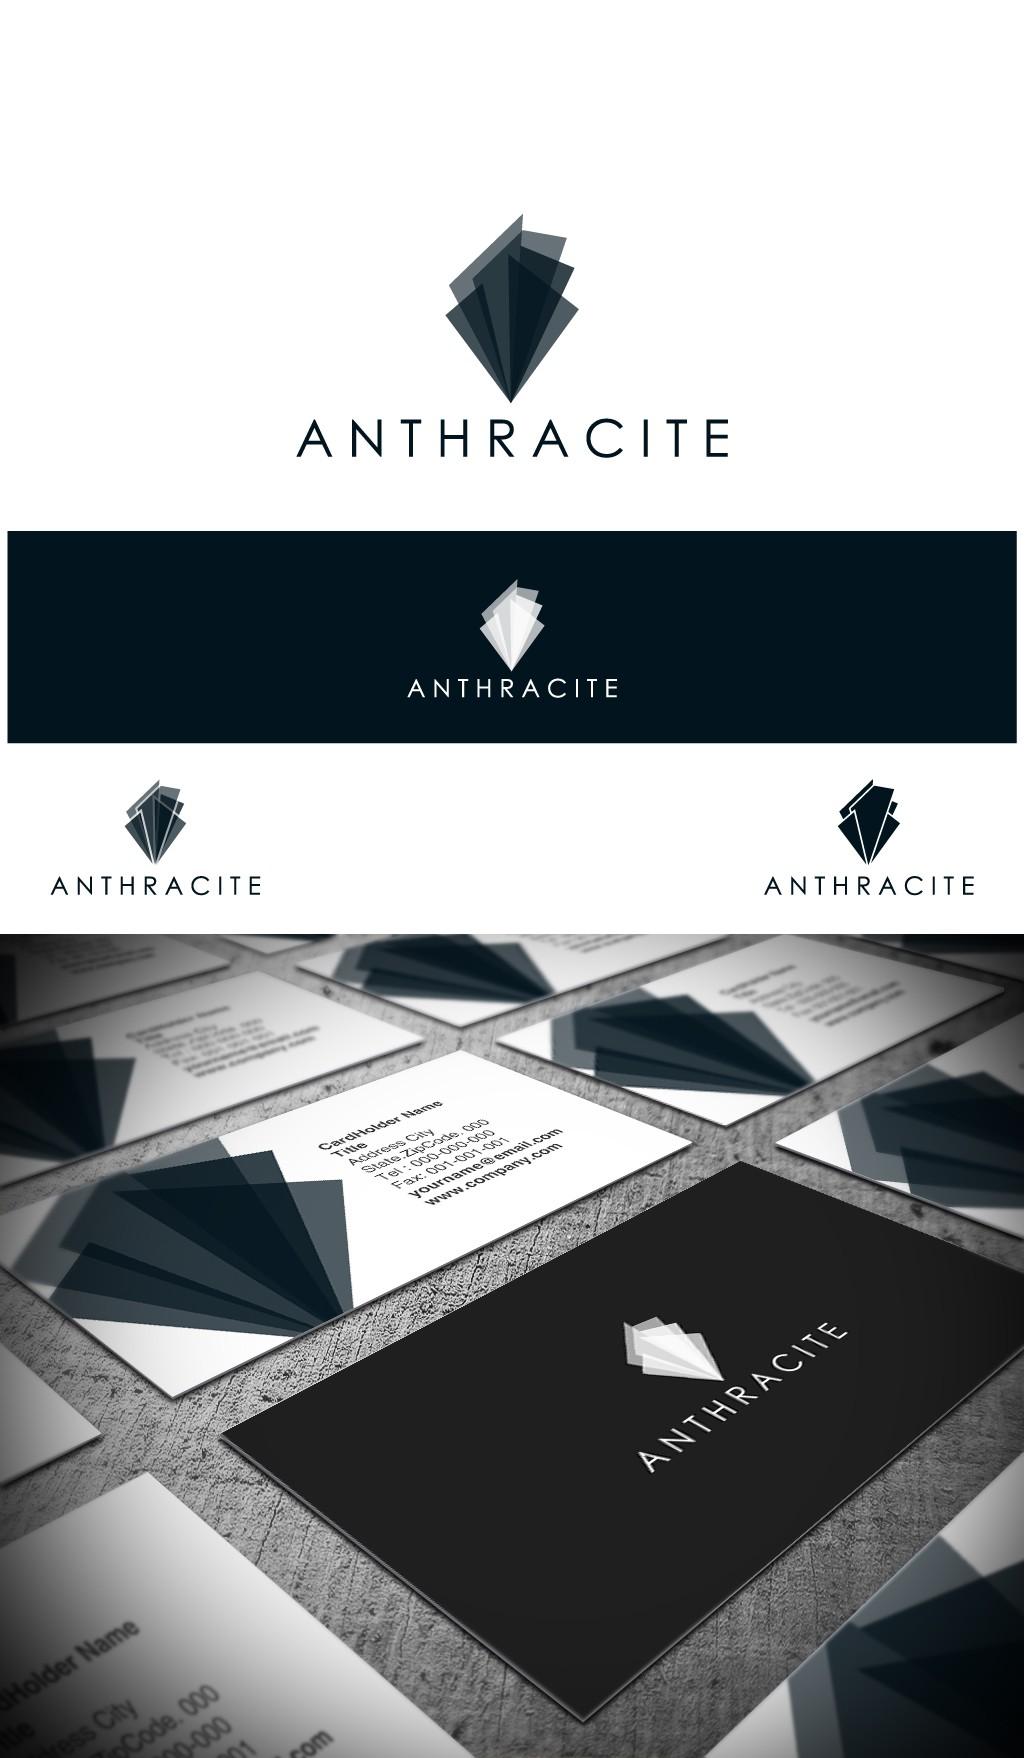 Anthracite - Logo For Enterprise Technology Company